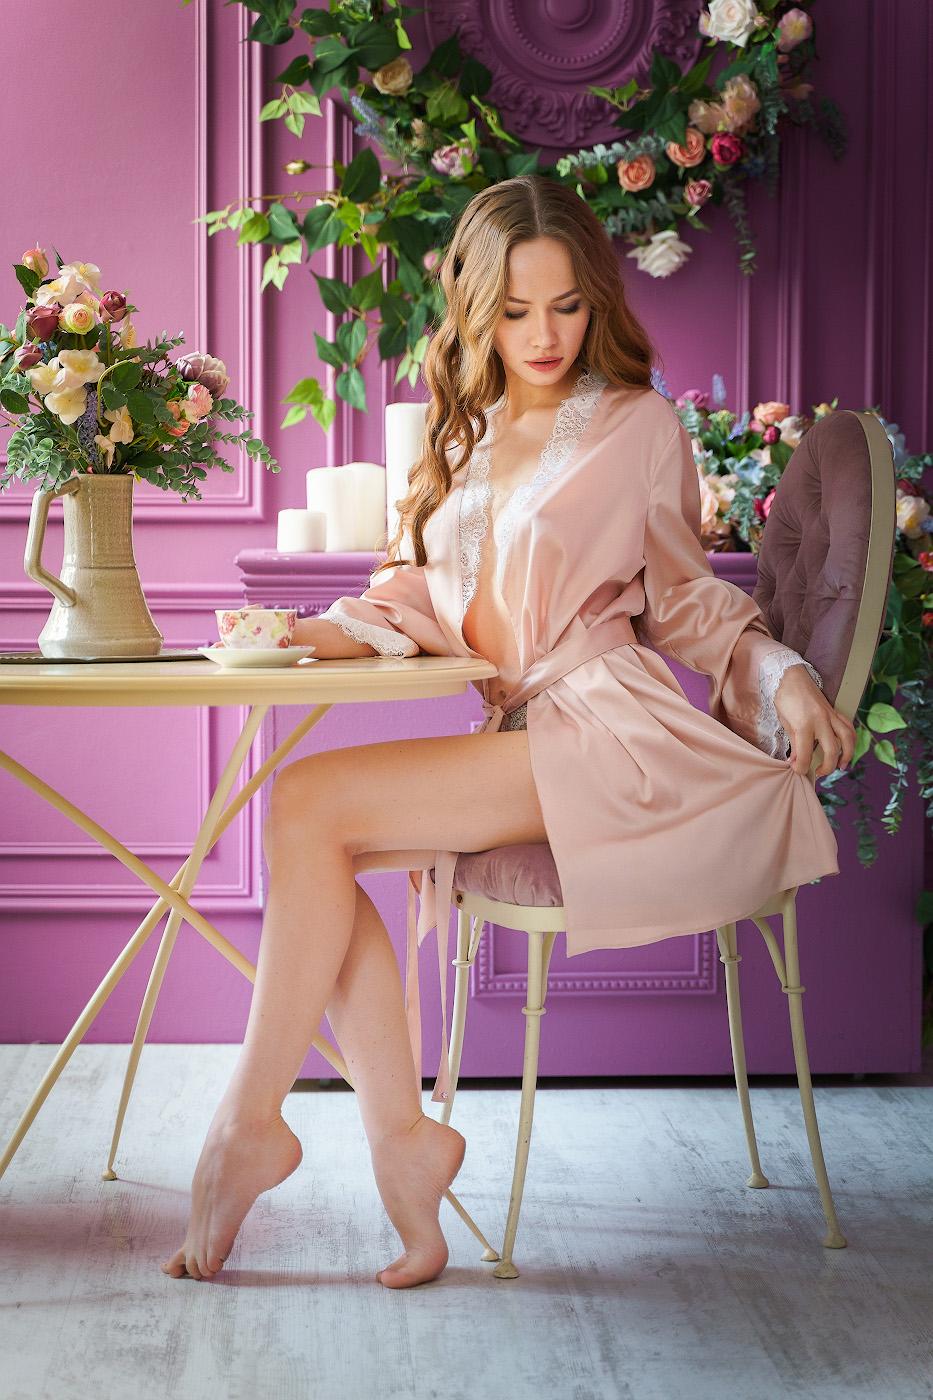 татьяна скоробогатова фото онлайн мягкой фиолетовом